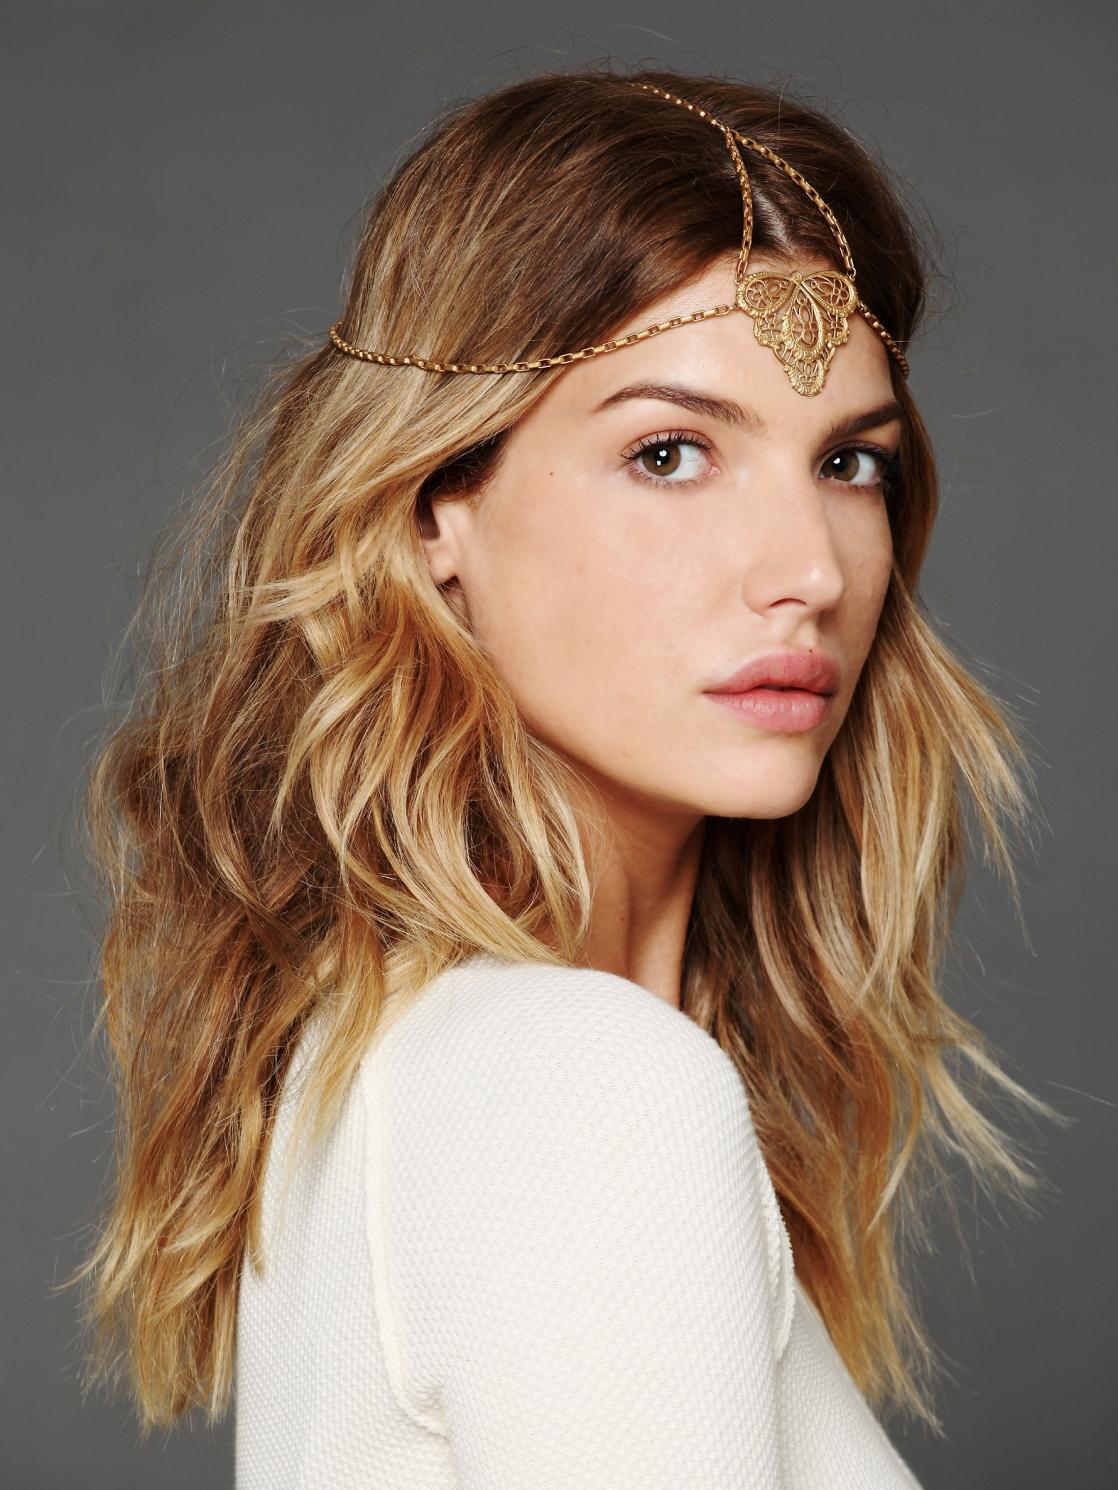 Chloe Bello